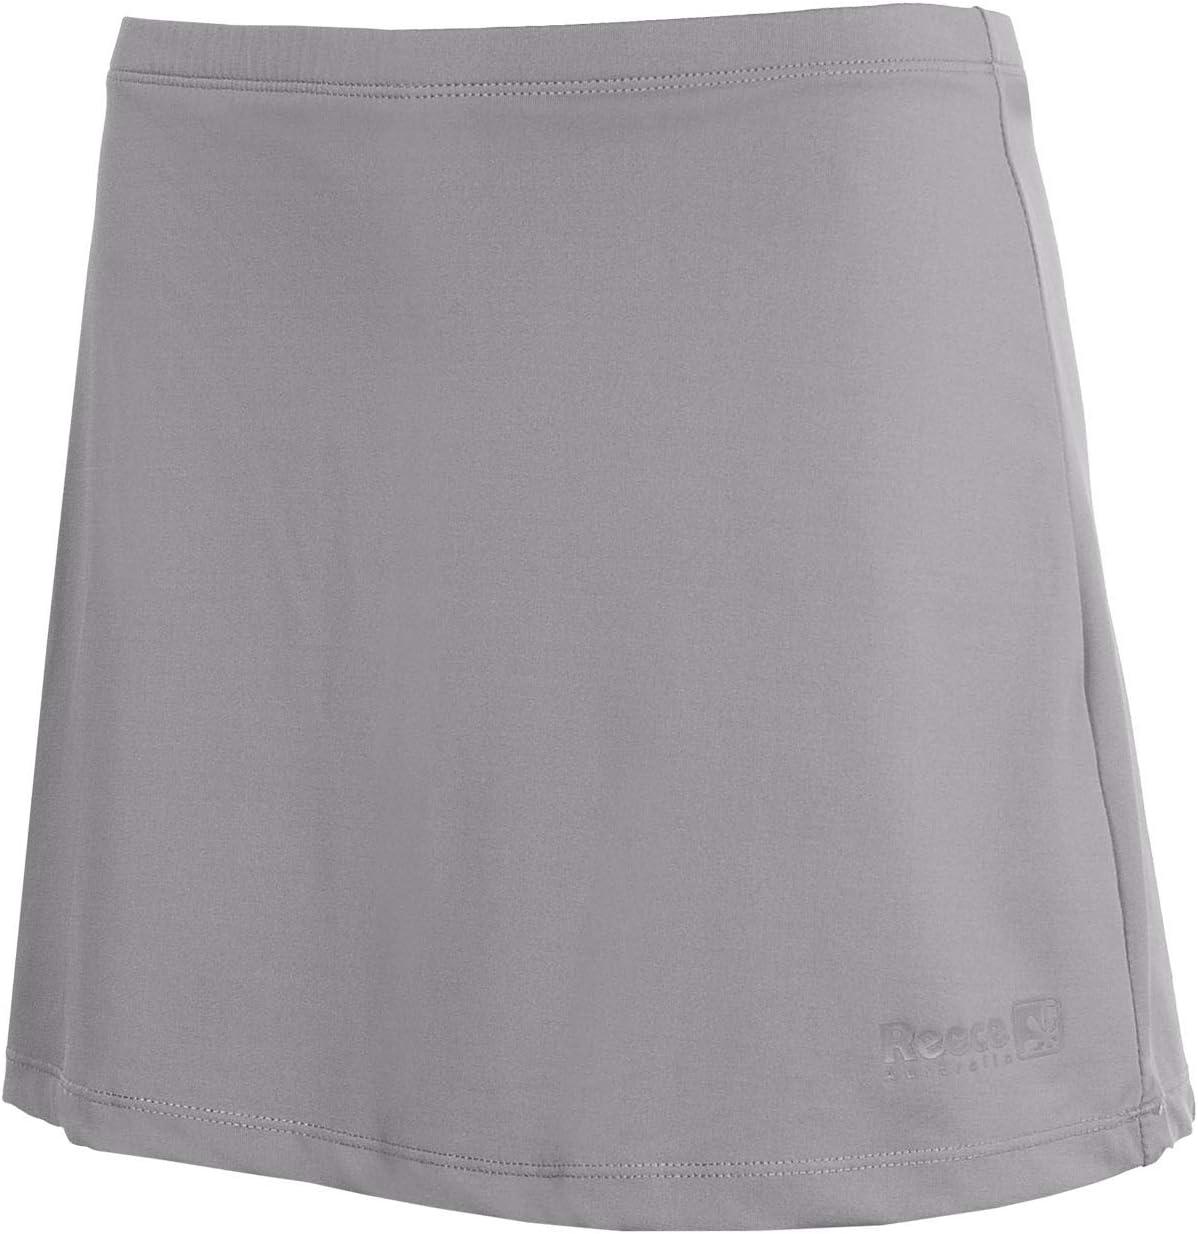 Reece FunDamental Skort Damen, Größe:XXL, Farbe:Sport Grey